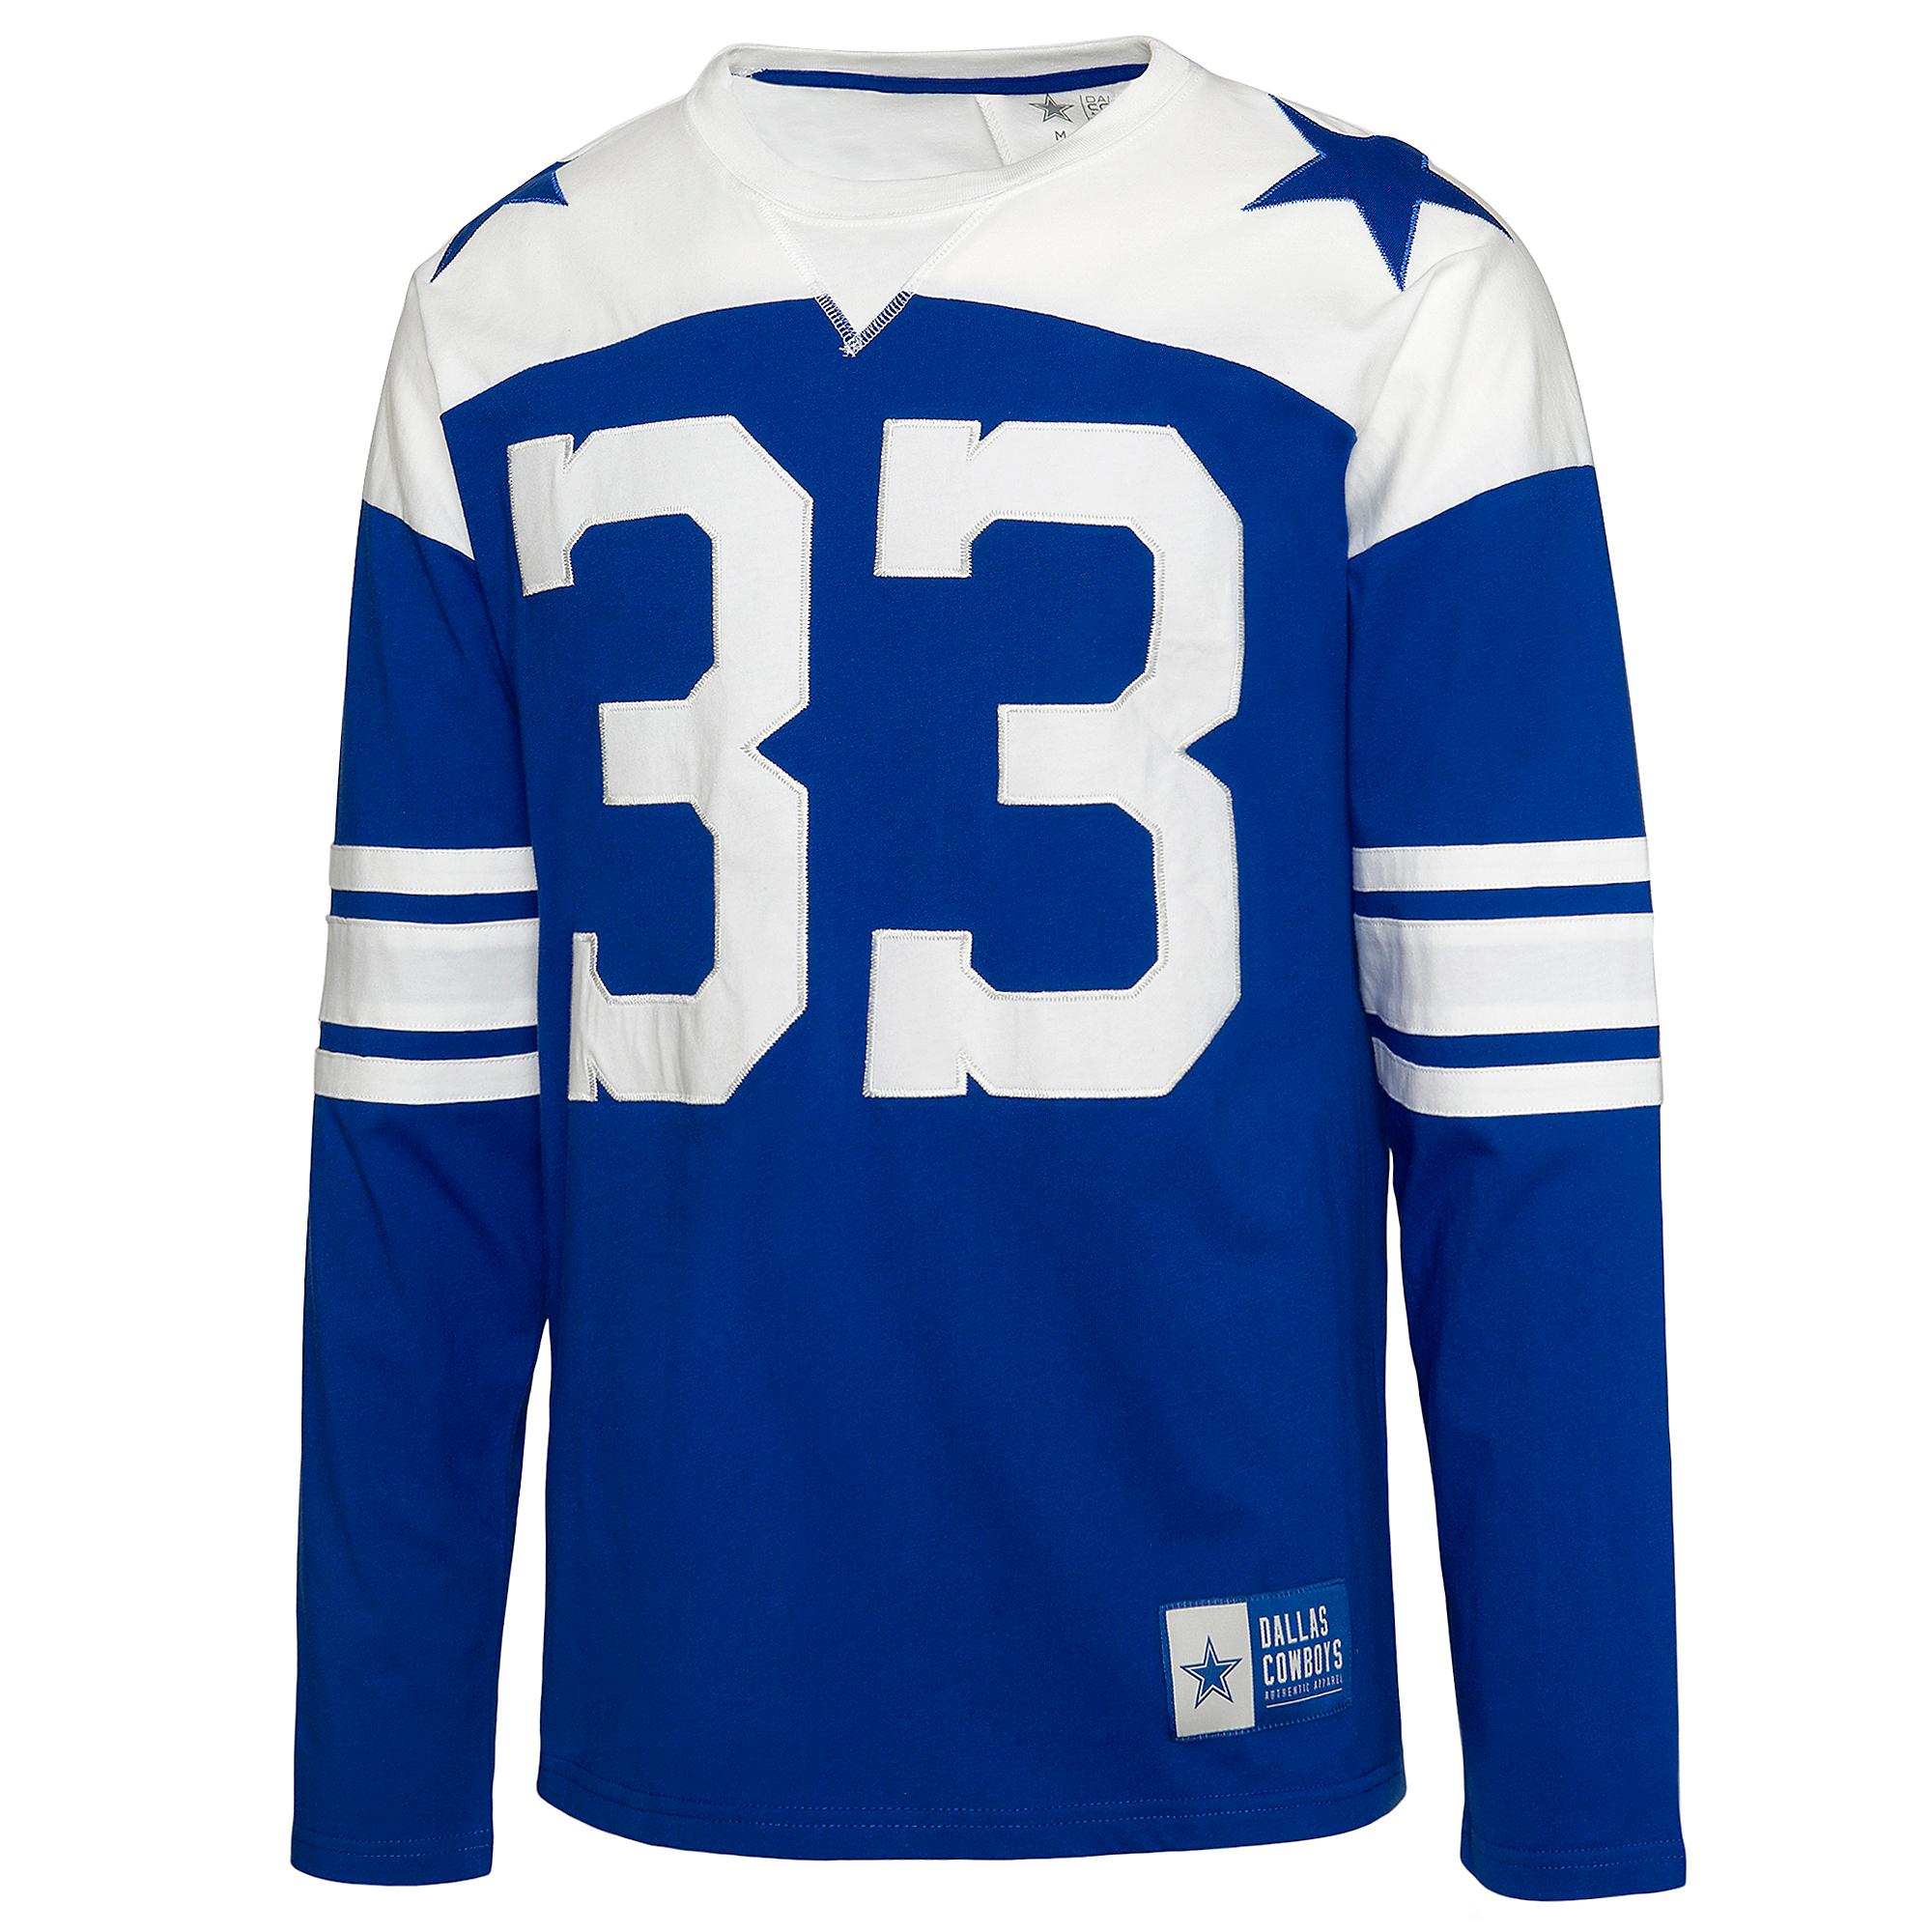 Dallas Cowboys Mens Rivalry Tony Dorsett #33 Long Sleeve T-Shirt